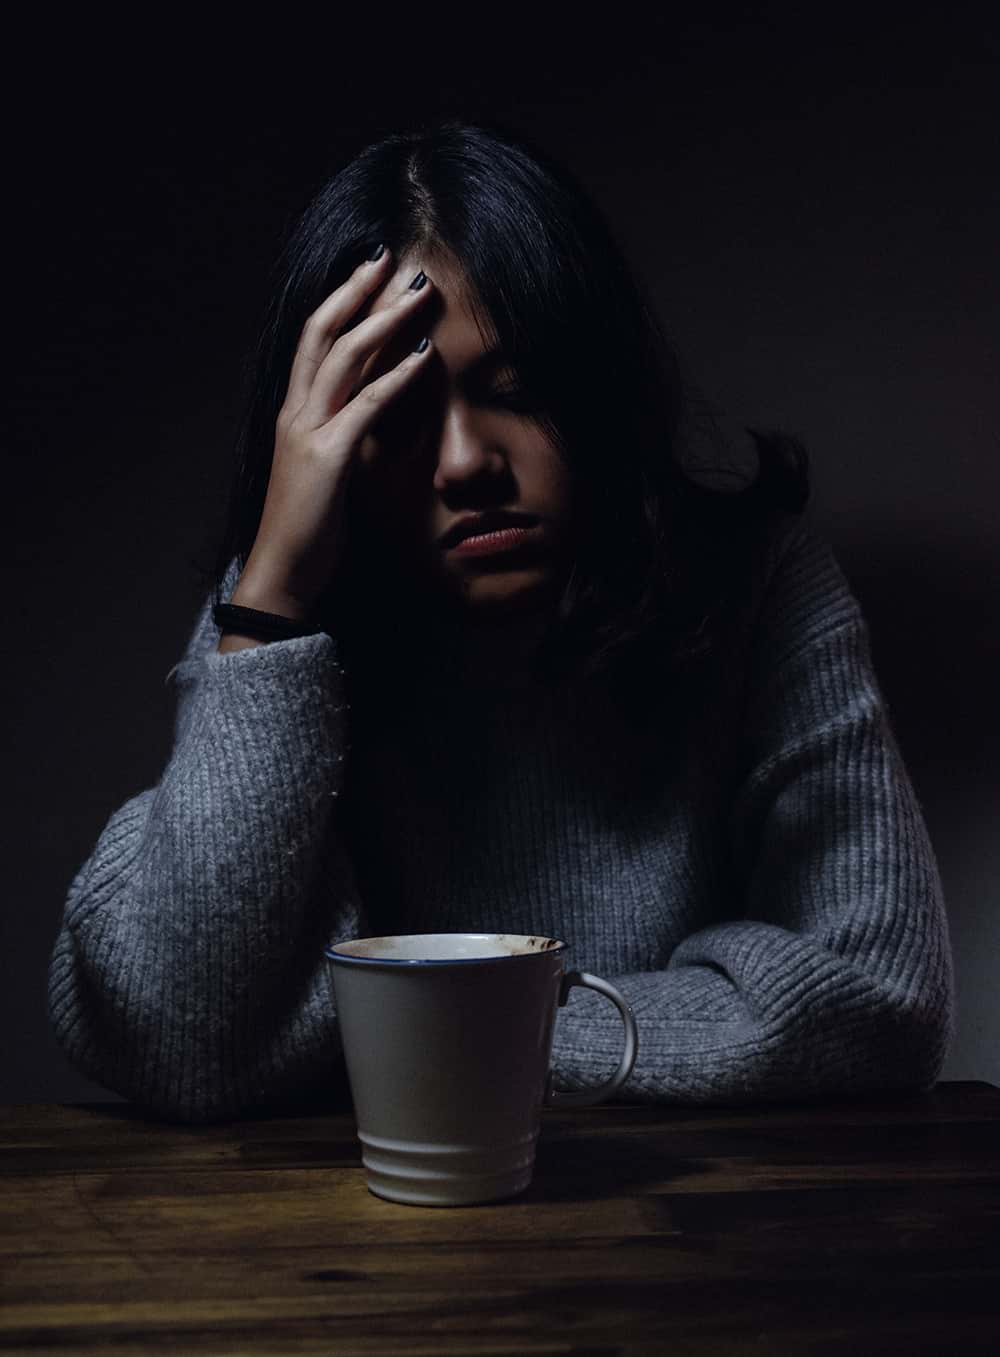 Woman suffering in darkness